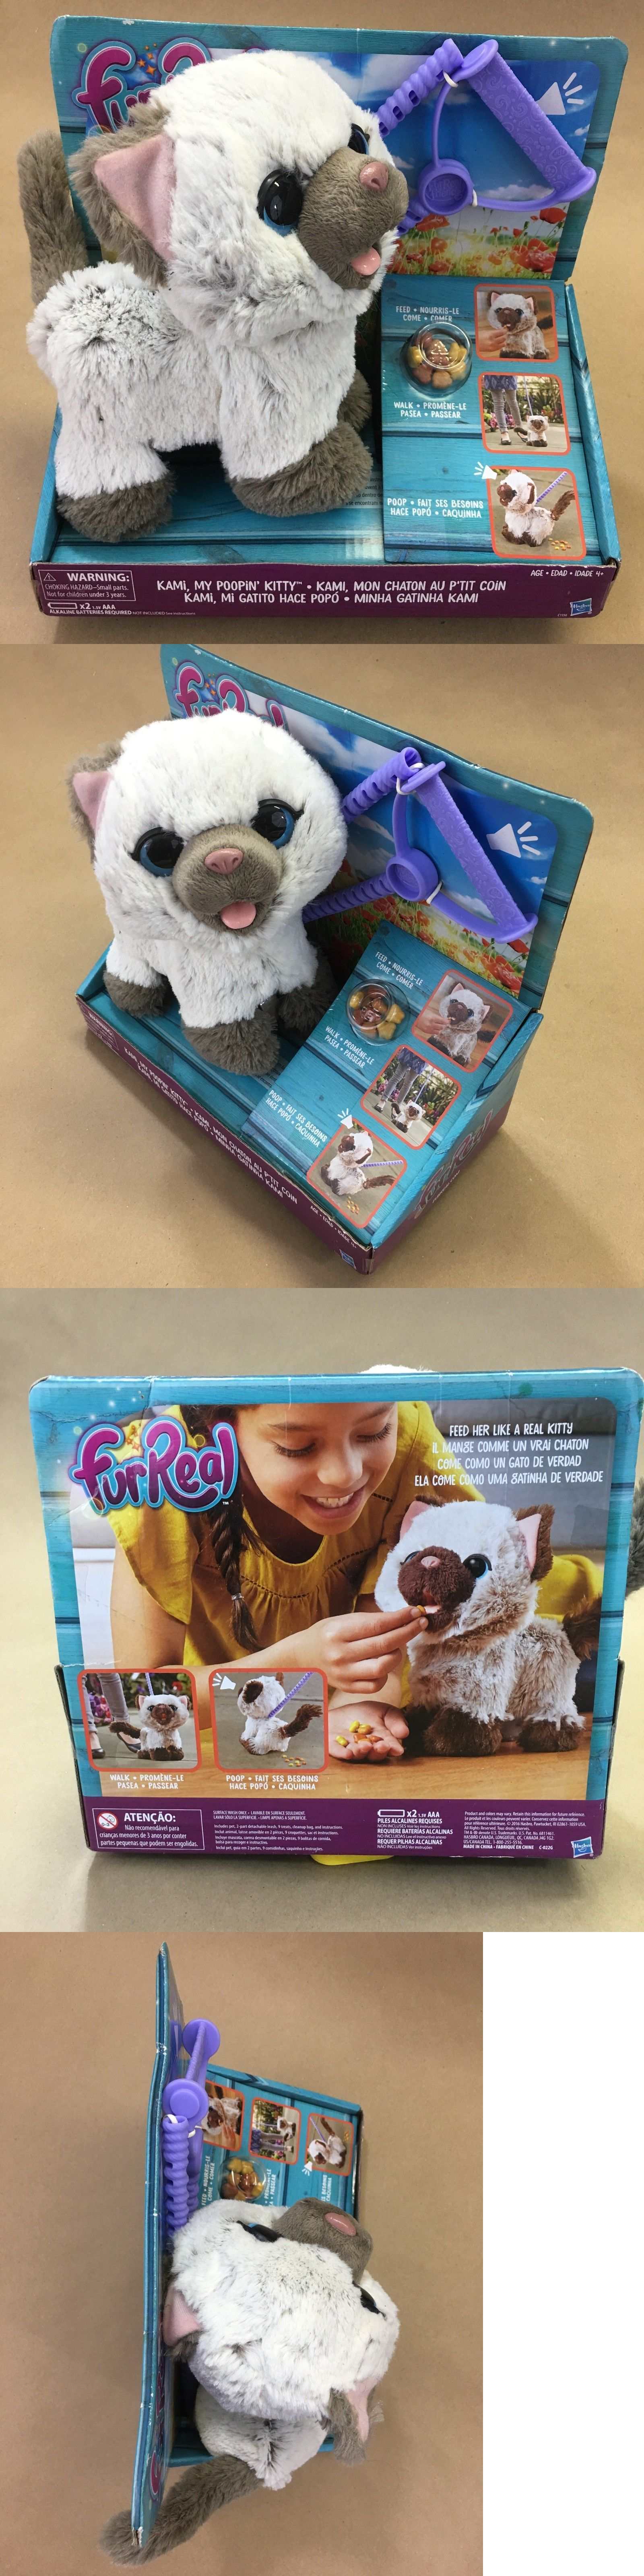 Furreal Friends 38288 New Fur Real Friends My Poopin Kitty Pet